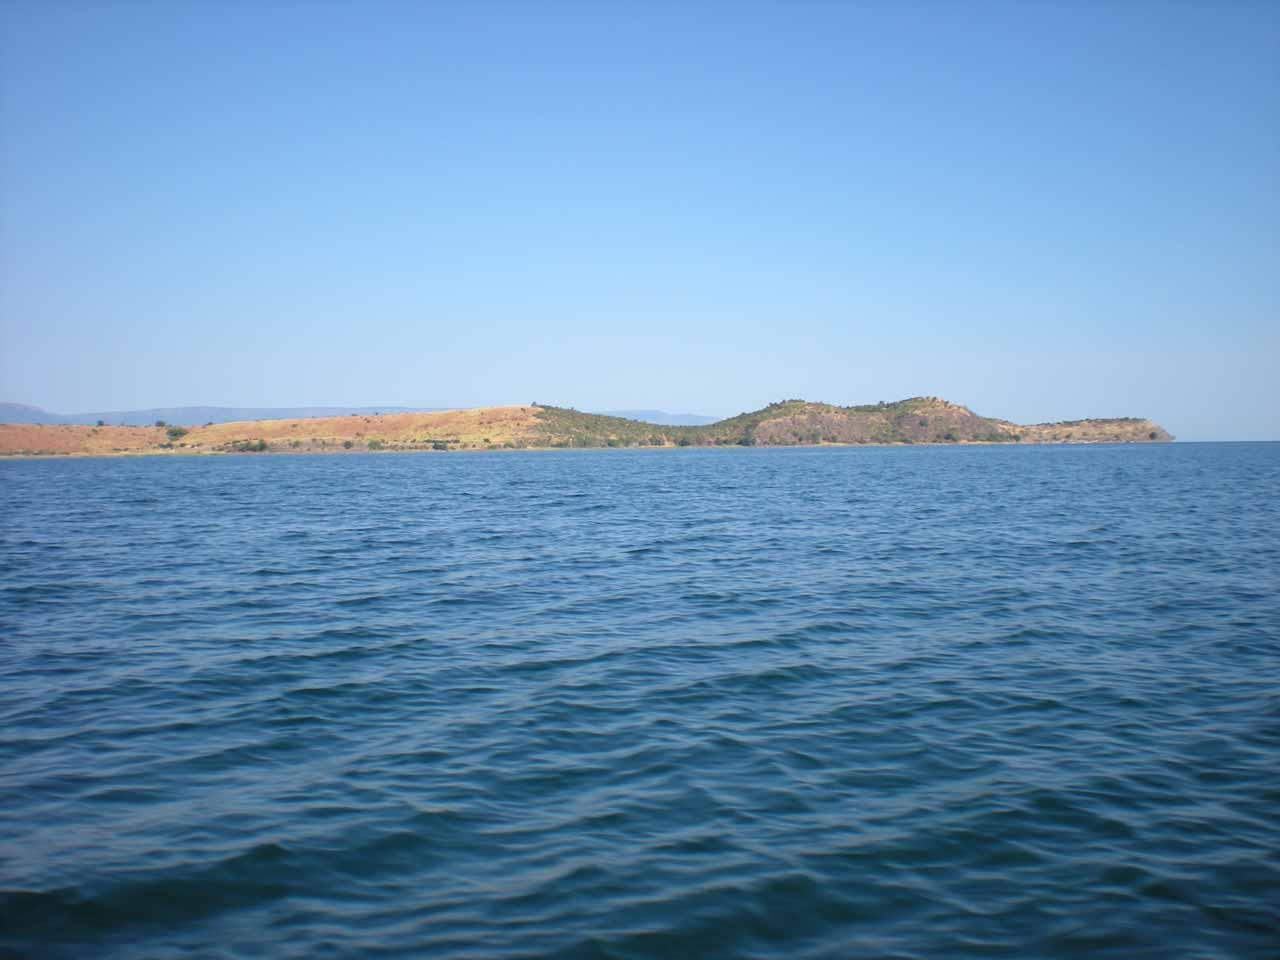 Crocodile Island on Lake Tanganyika